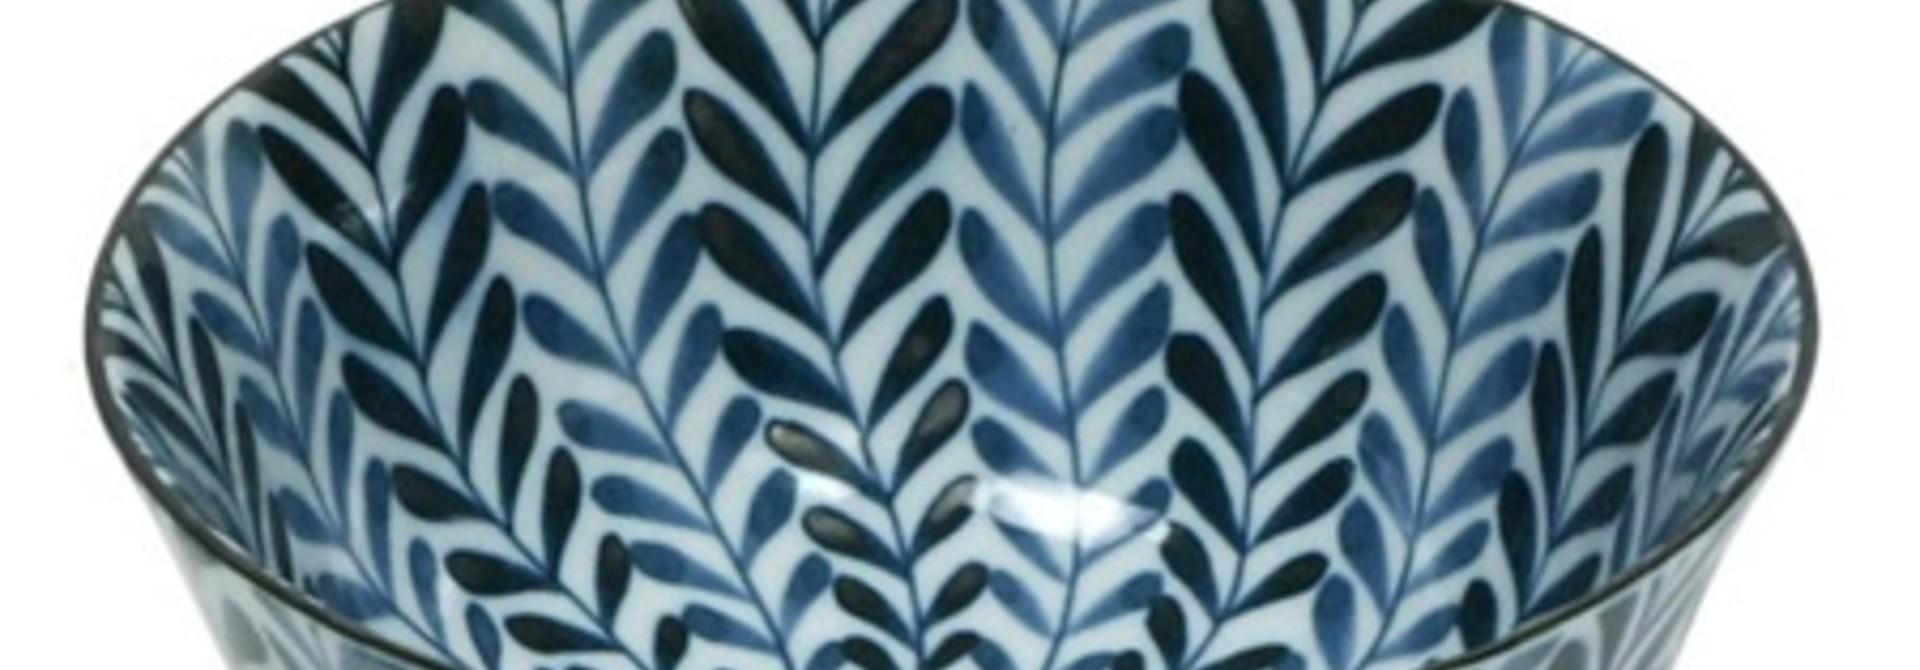 Shidae Ferns - Bowl